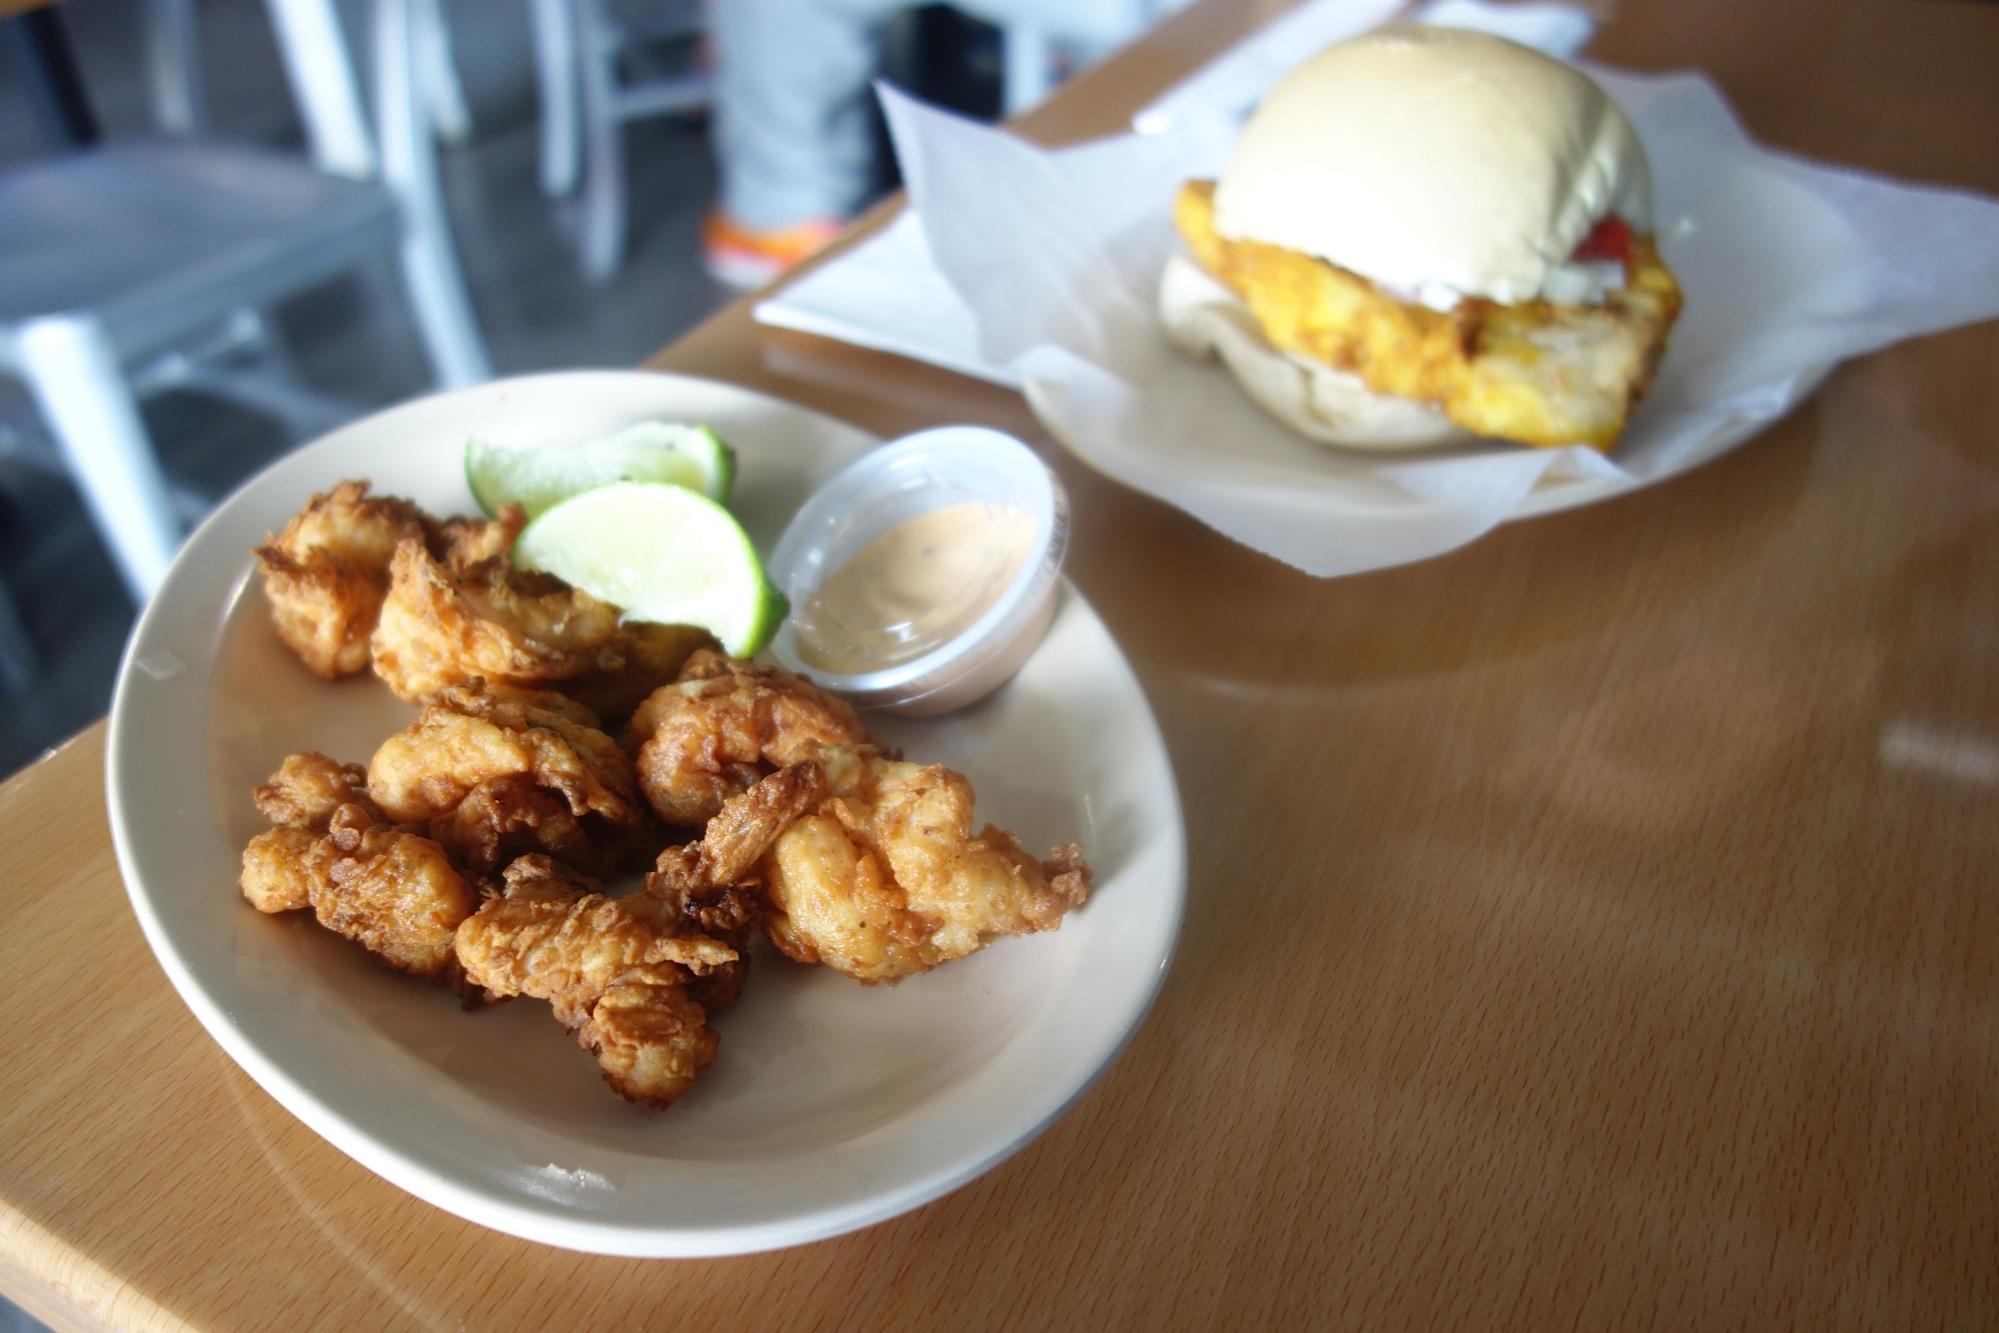 Fried Shrimp and Fried Fish Sandwich at La Camaronera